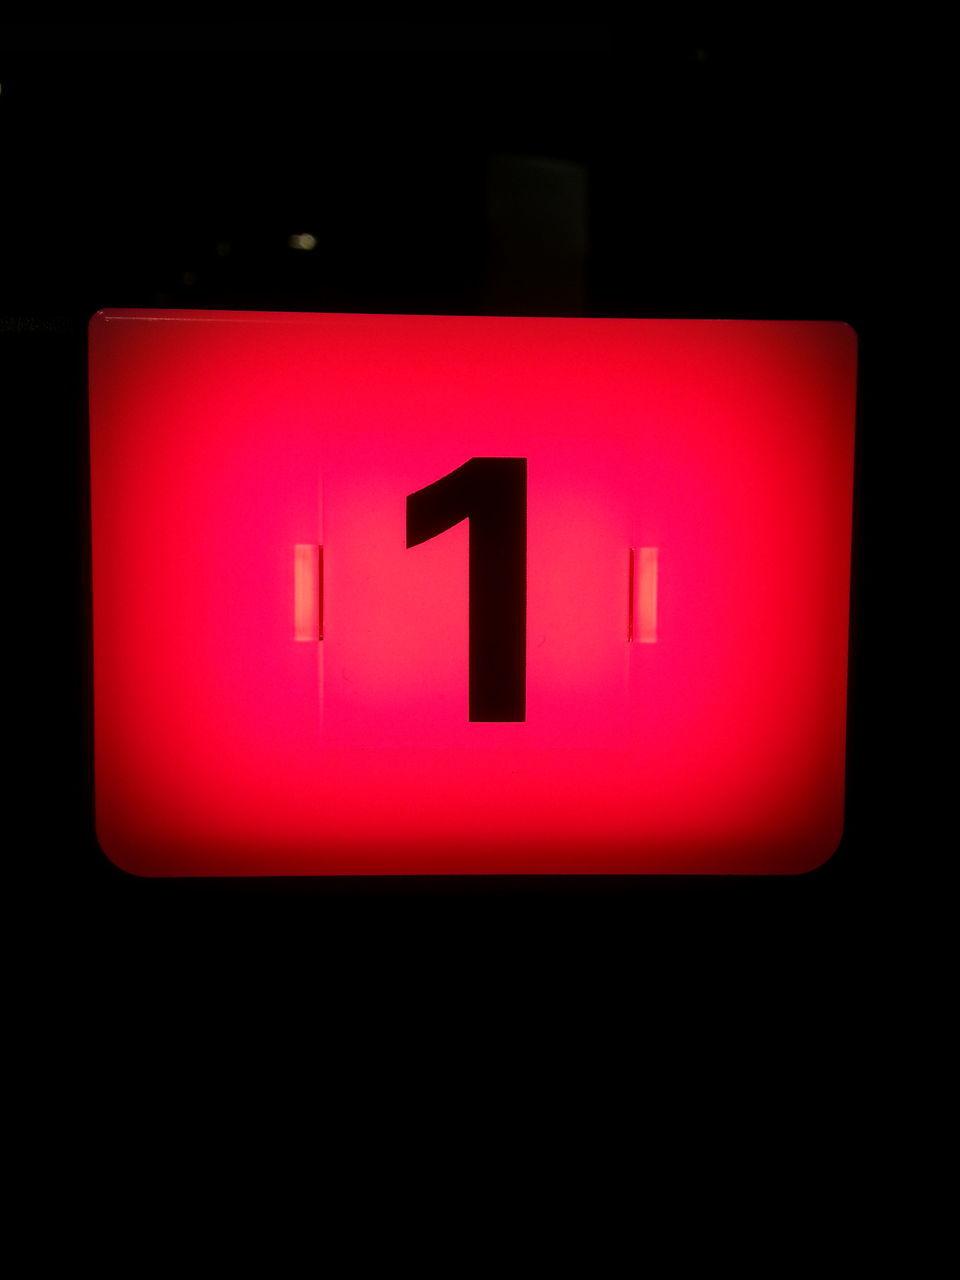 communication, black background, guidance, dark, studio shot, exit sign, illuminated, direction, no people, red, indoors, information medium, technology, neon, close-up